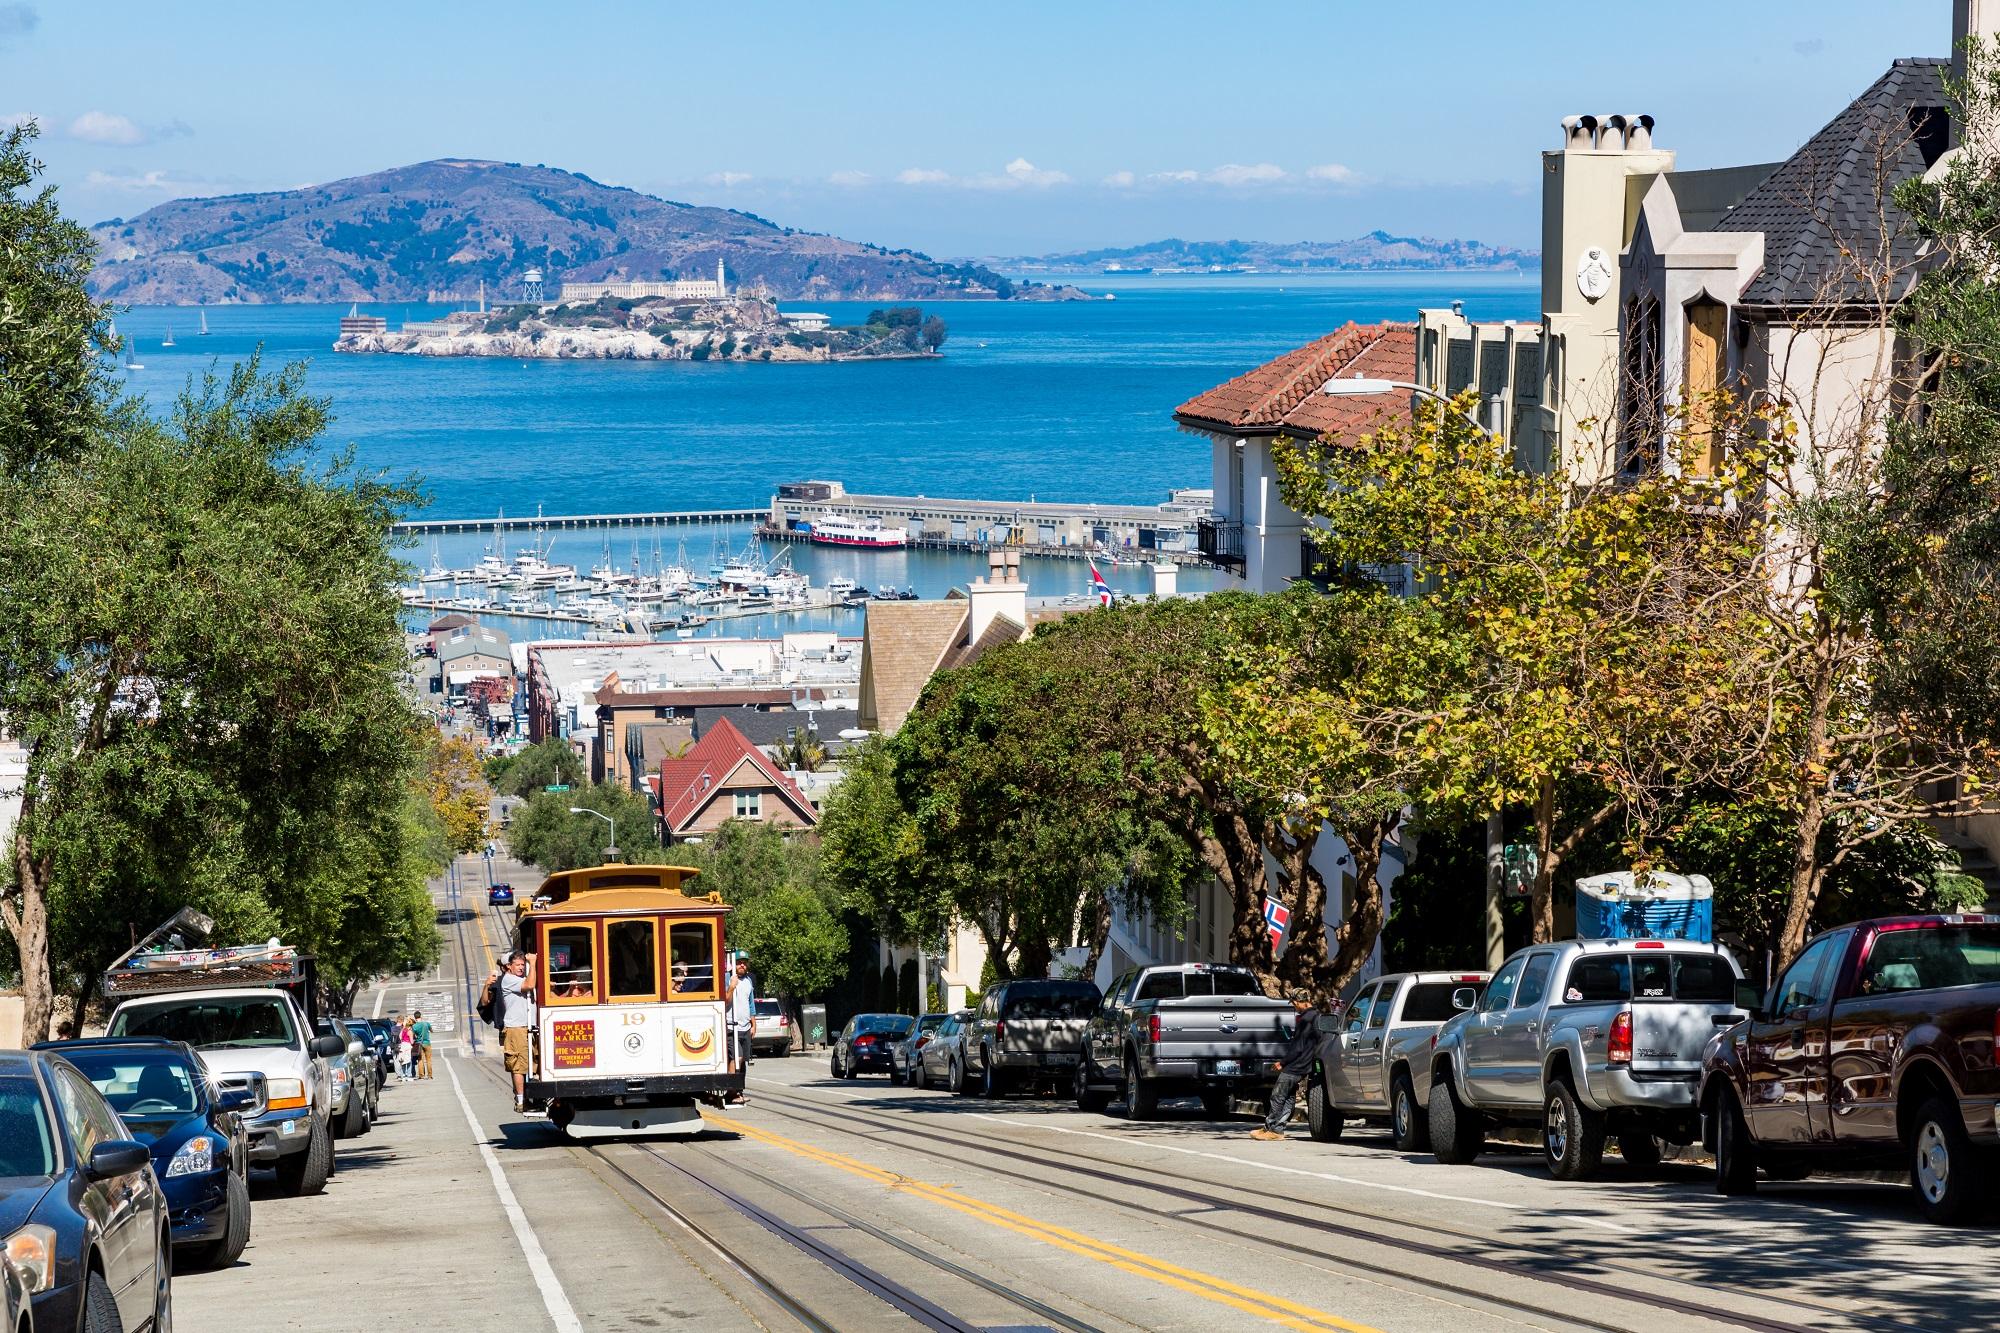 FDI World Dental Congress San Francisco 2019